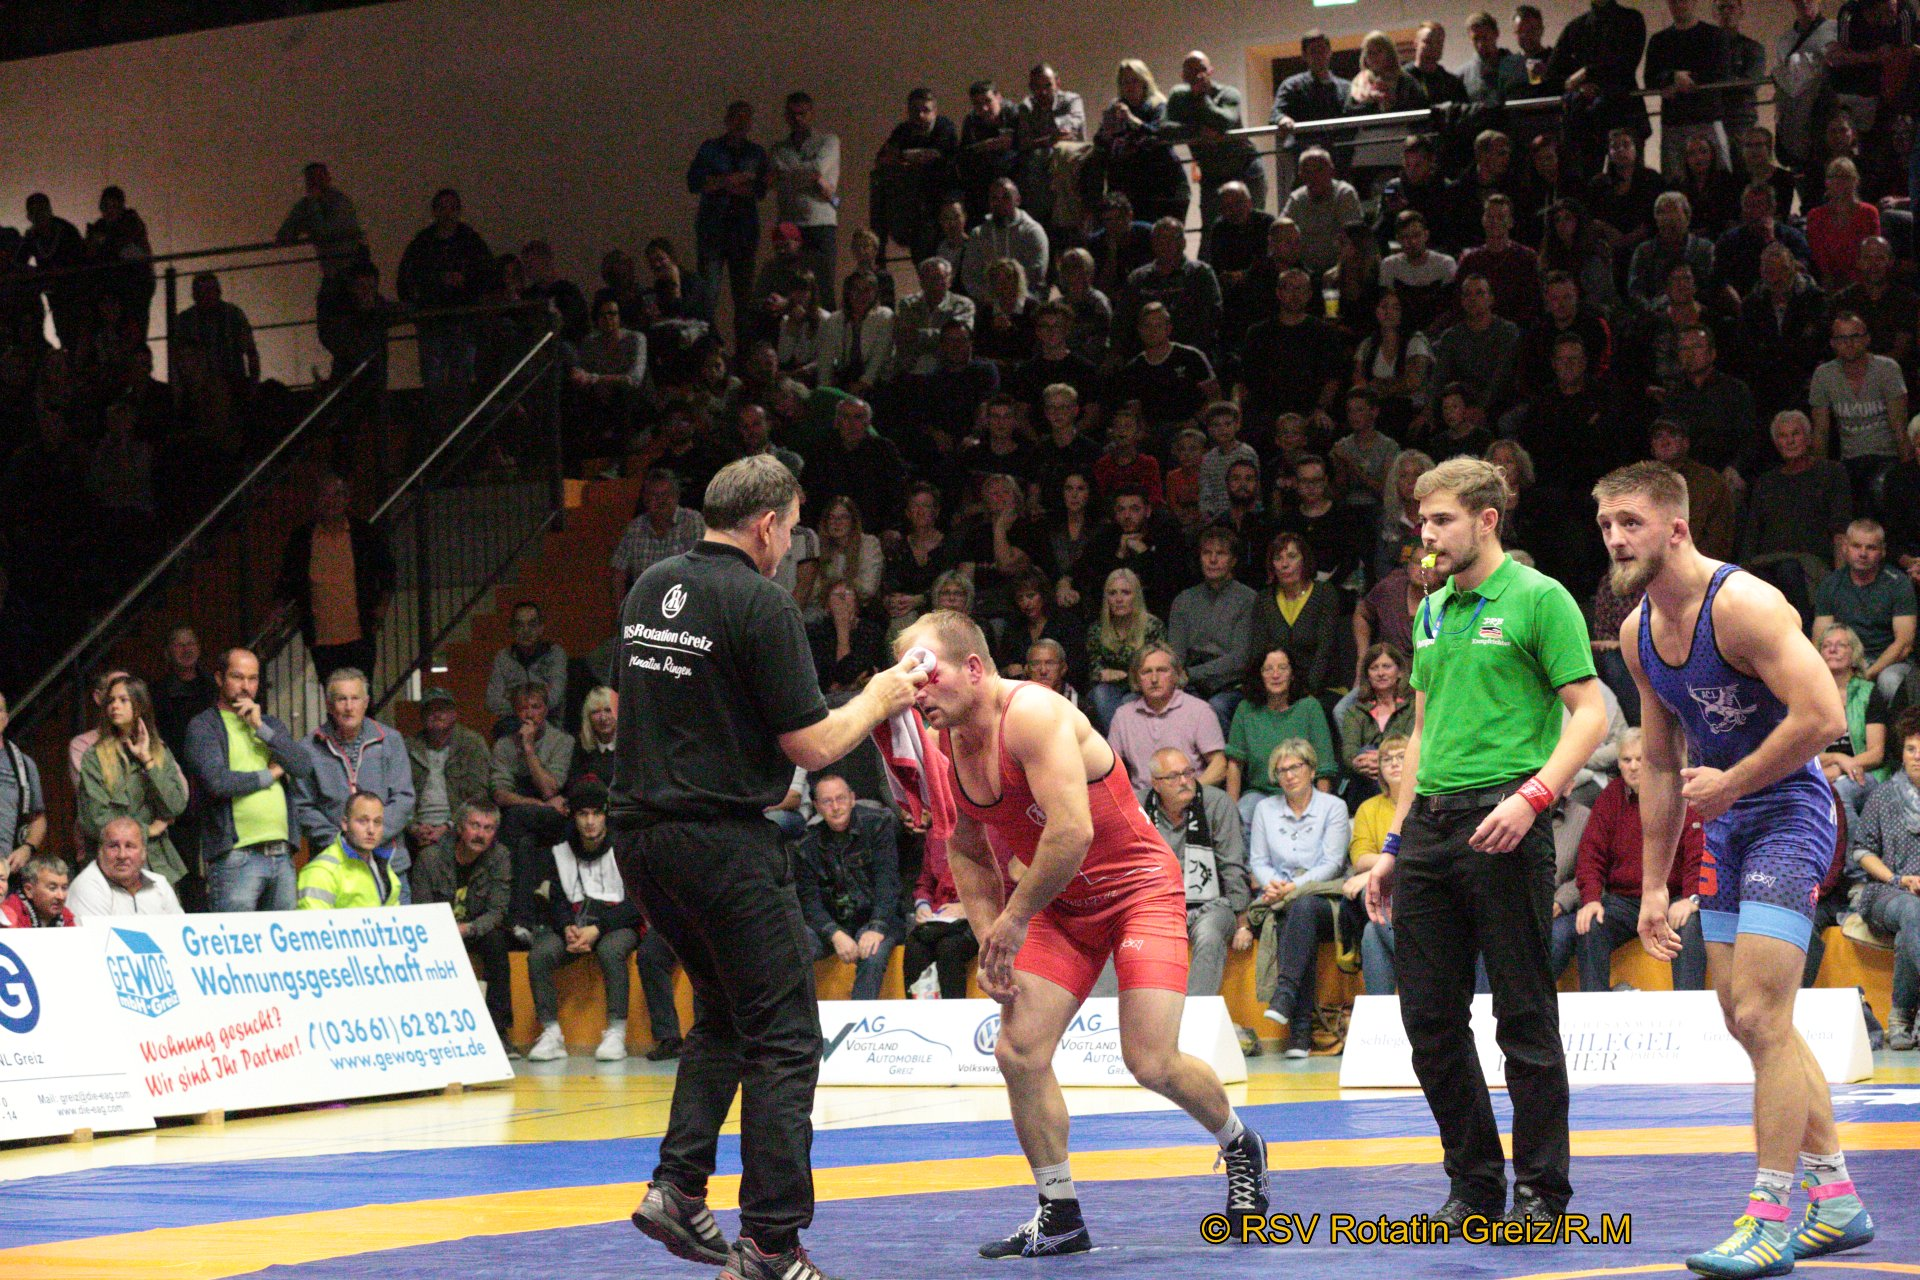 80kg Freistil: Martin Obst (3) (rotes Trikot), RSV Rotation Greiz gegen Andrzej Sokalski EU (5), AC Lichtenfels 1:0/PS/5:3/06:00